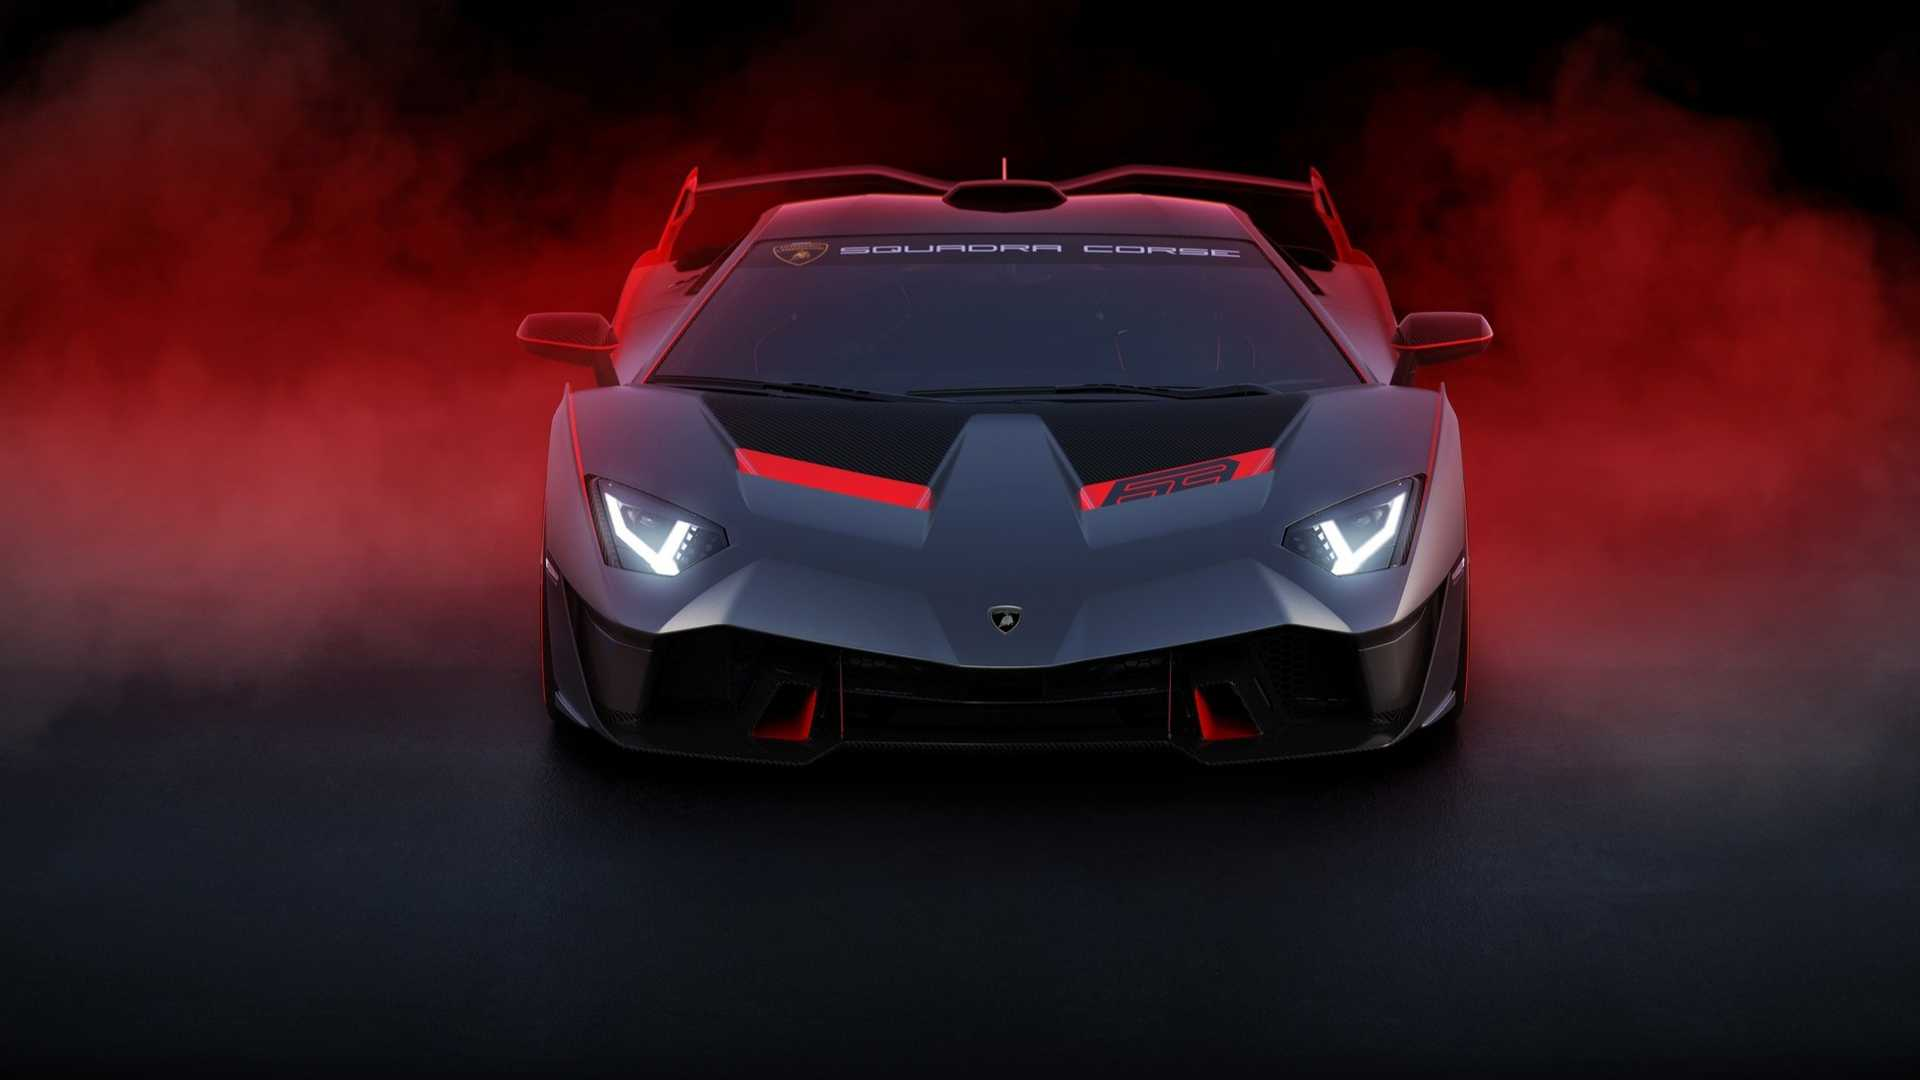 Formacar Next Lamborghini Supercar Scheduled For 2020